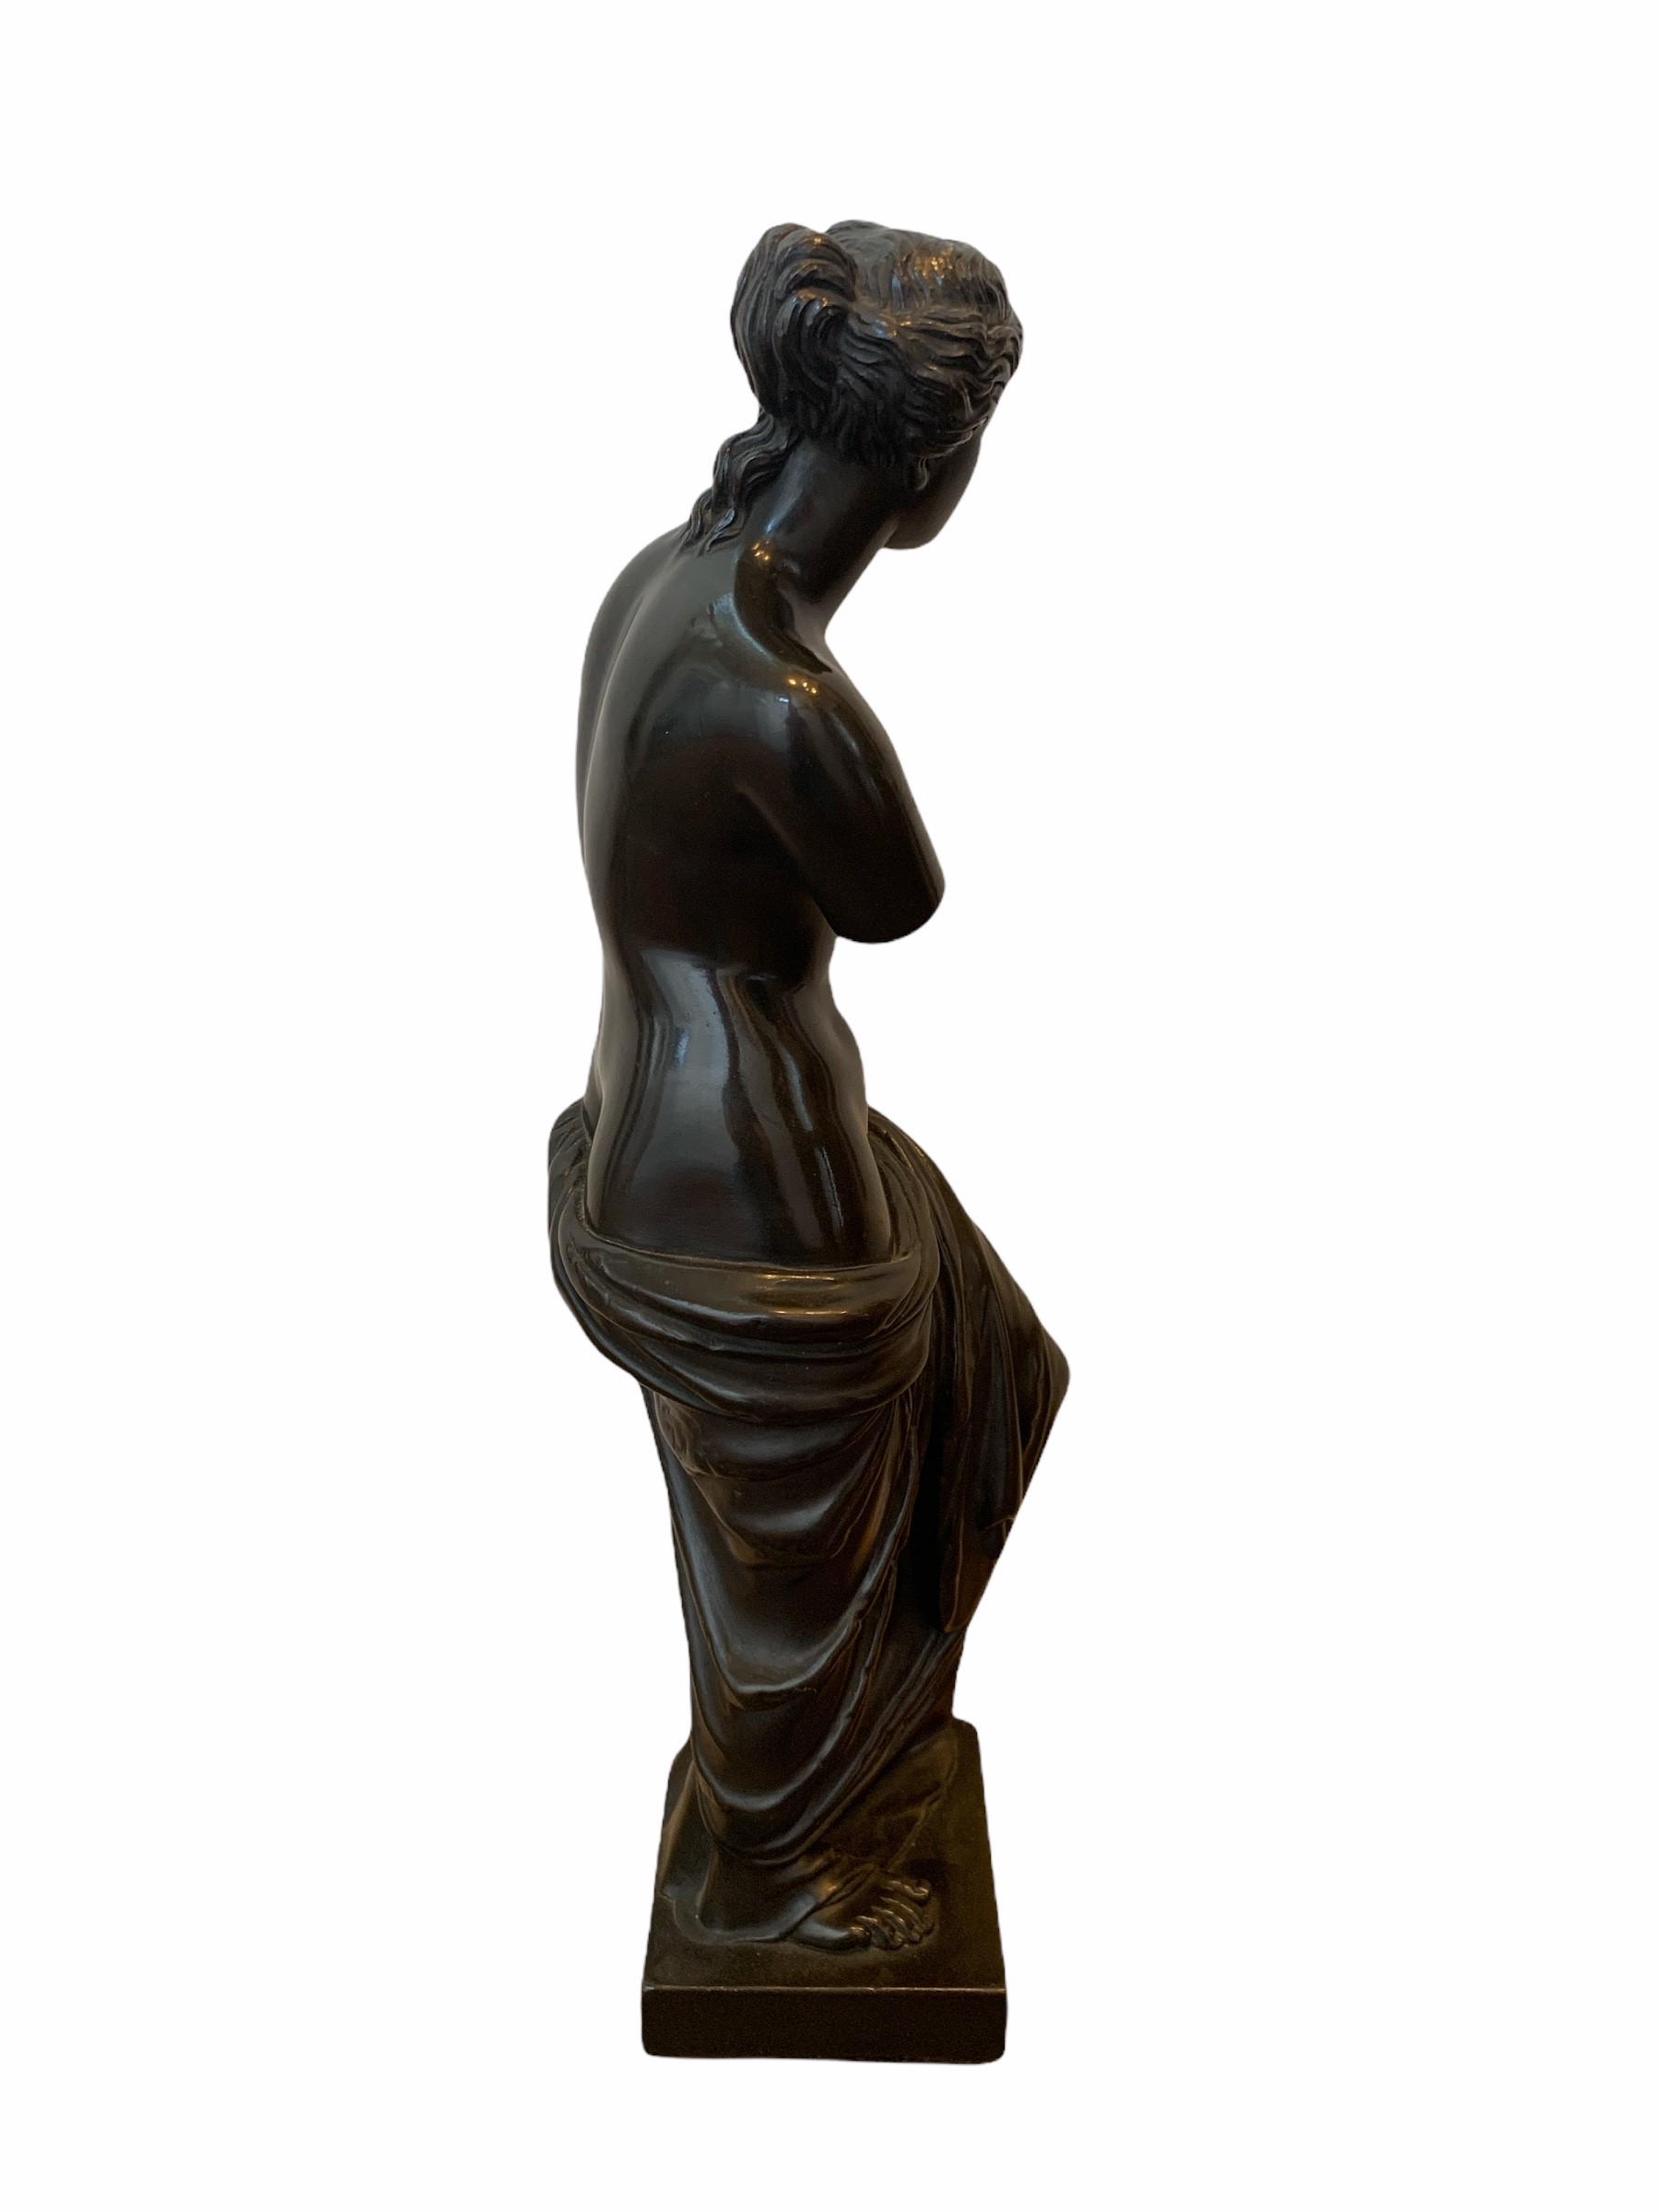 A 19TH CENTURY BRONZE CLAD STATUE OF A NEOCLASSICAL SEMINUDE FEMALE. (h 48cm x d 10.5cm x w 13cm) - Image 4 of 4